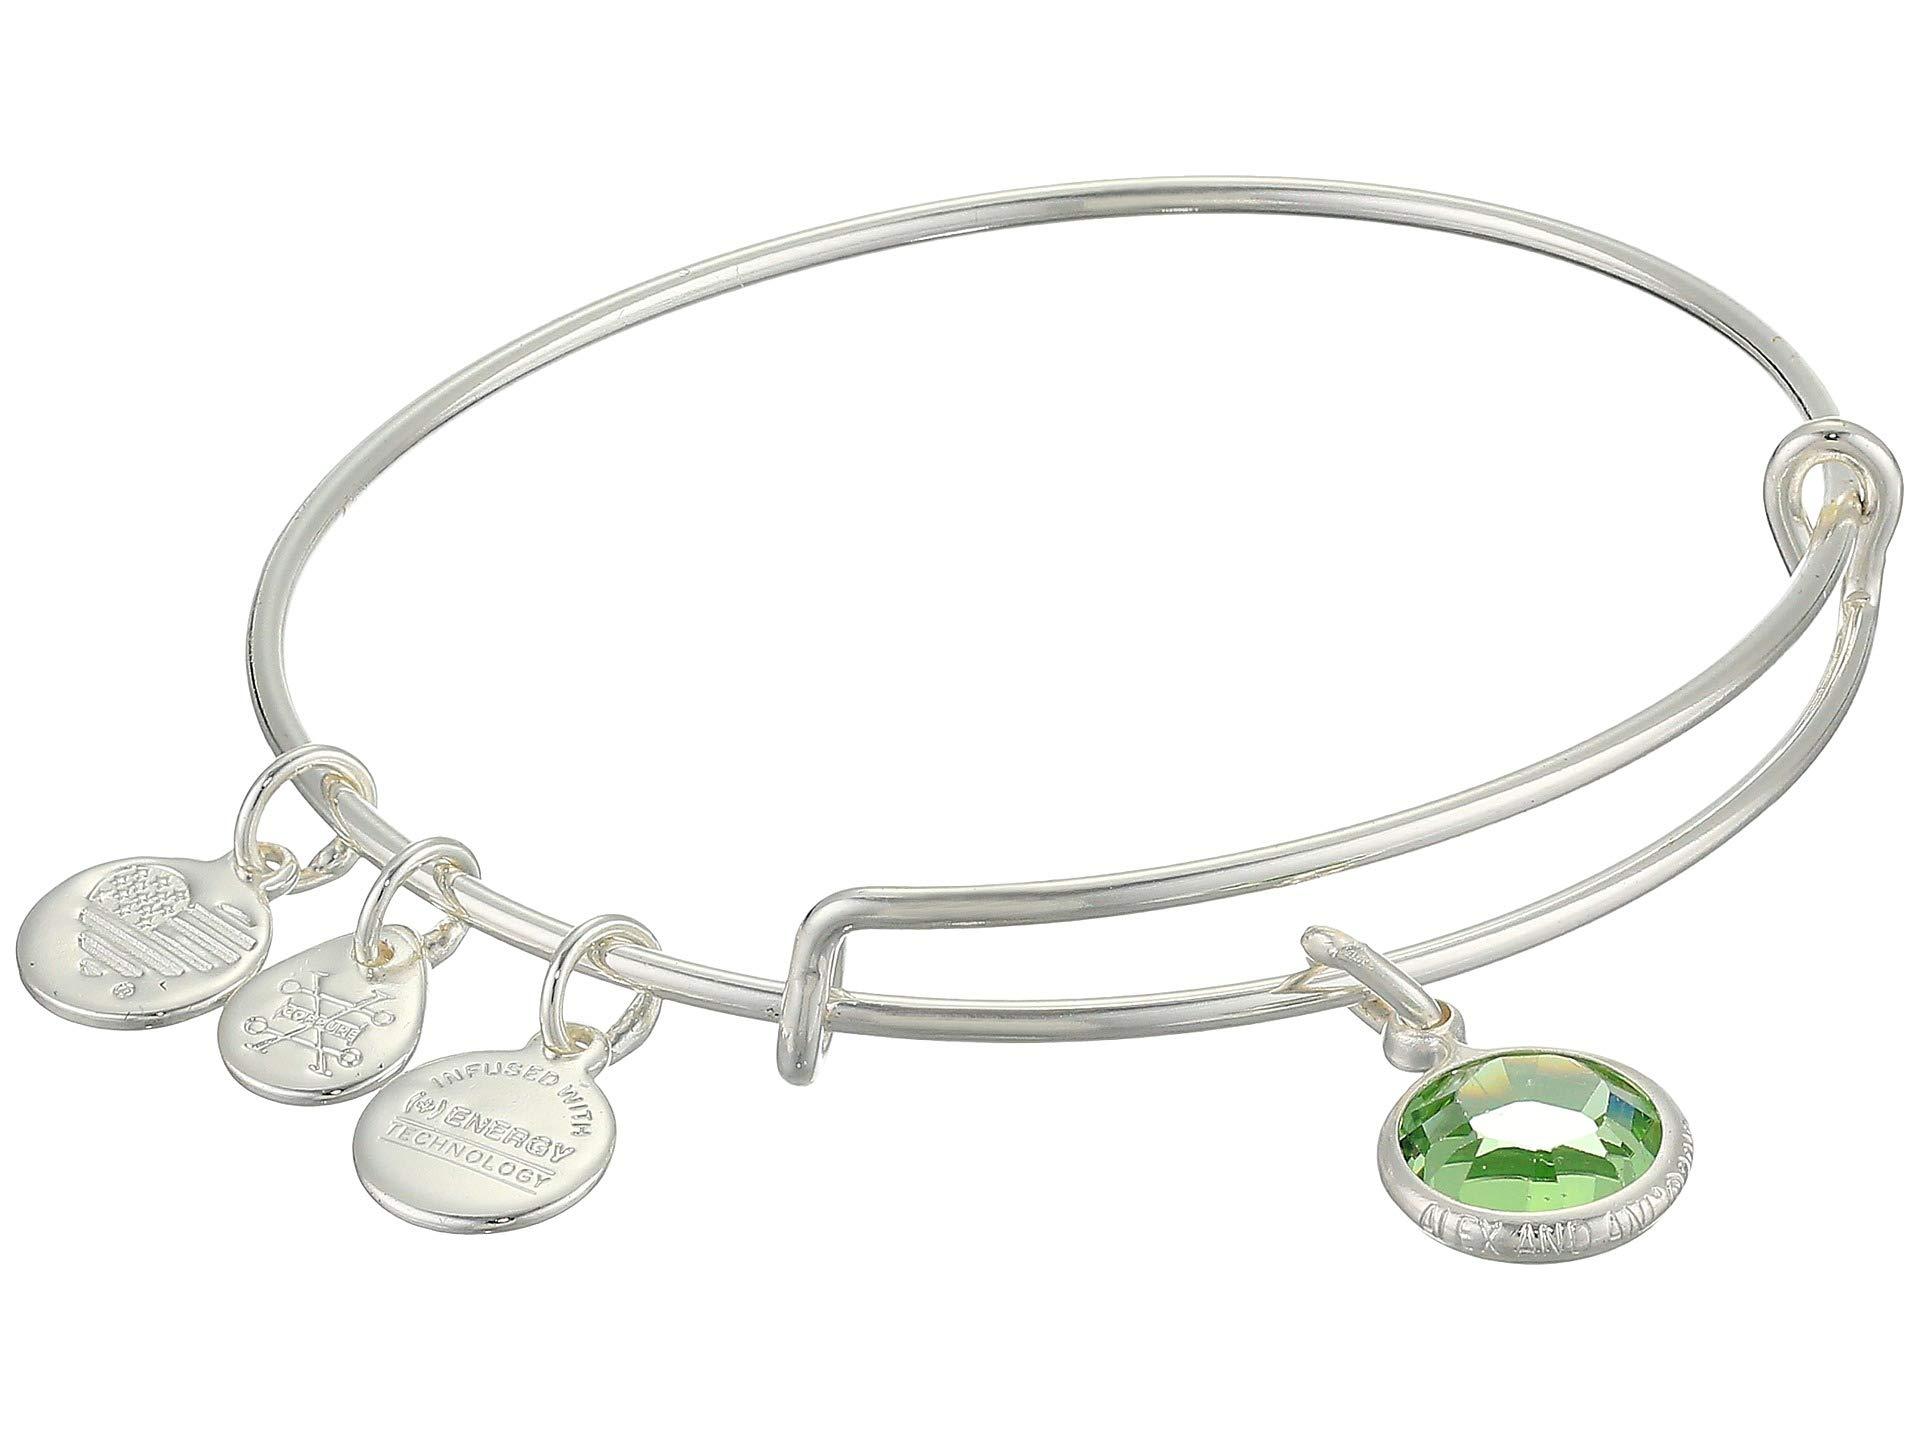 Alex and Ani Women's Swarovski Color Code Bangle August Peridot Bracelet, Shiny Silver